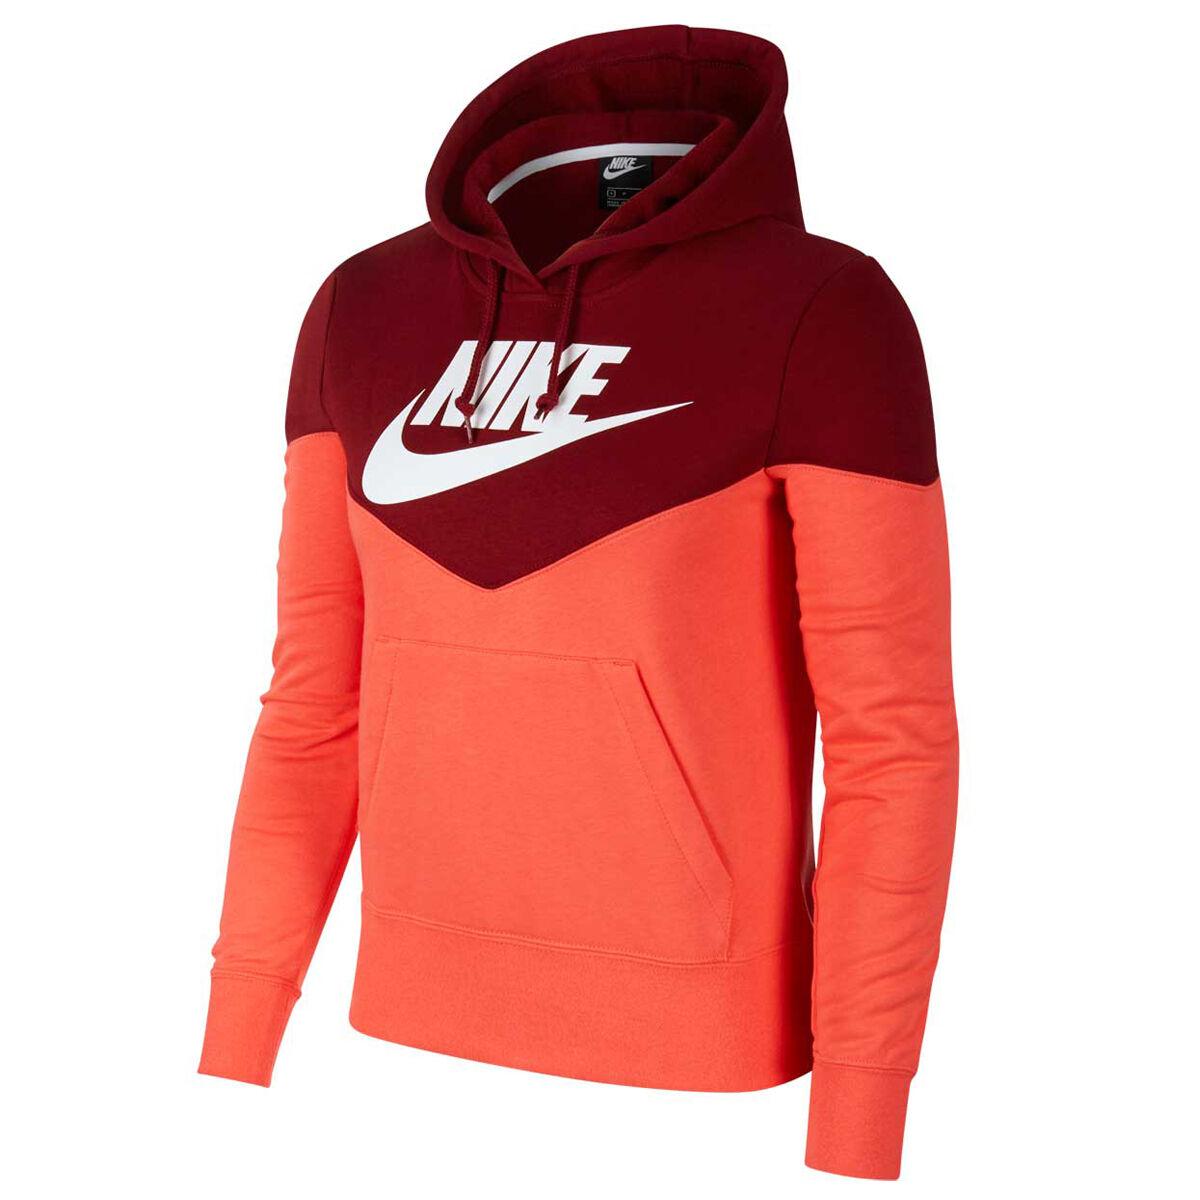 Cheap Womens Jackets & Hoodies Clothing rebel  supplier